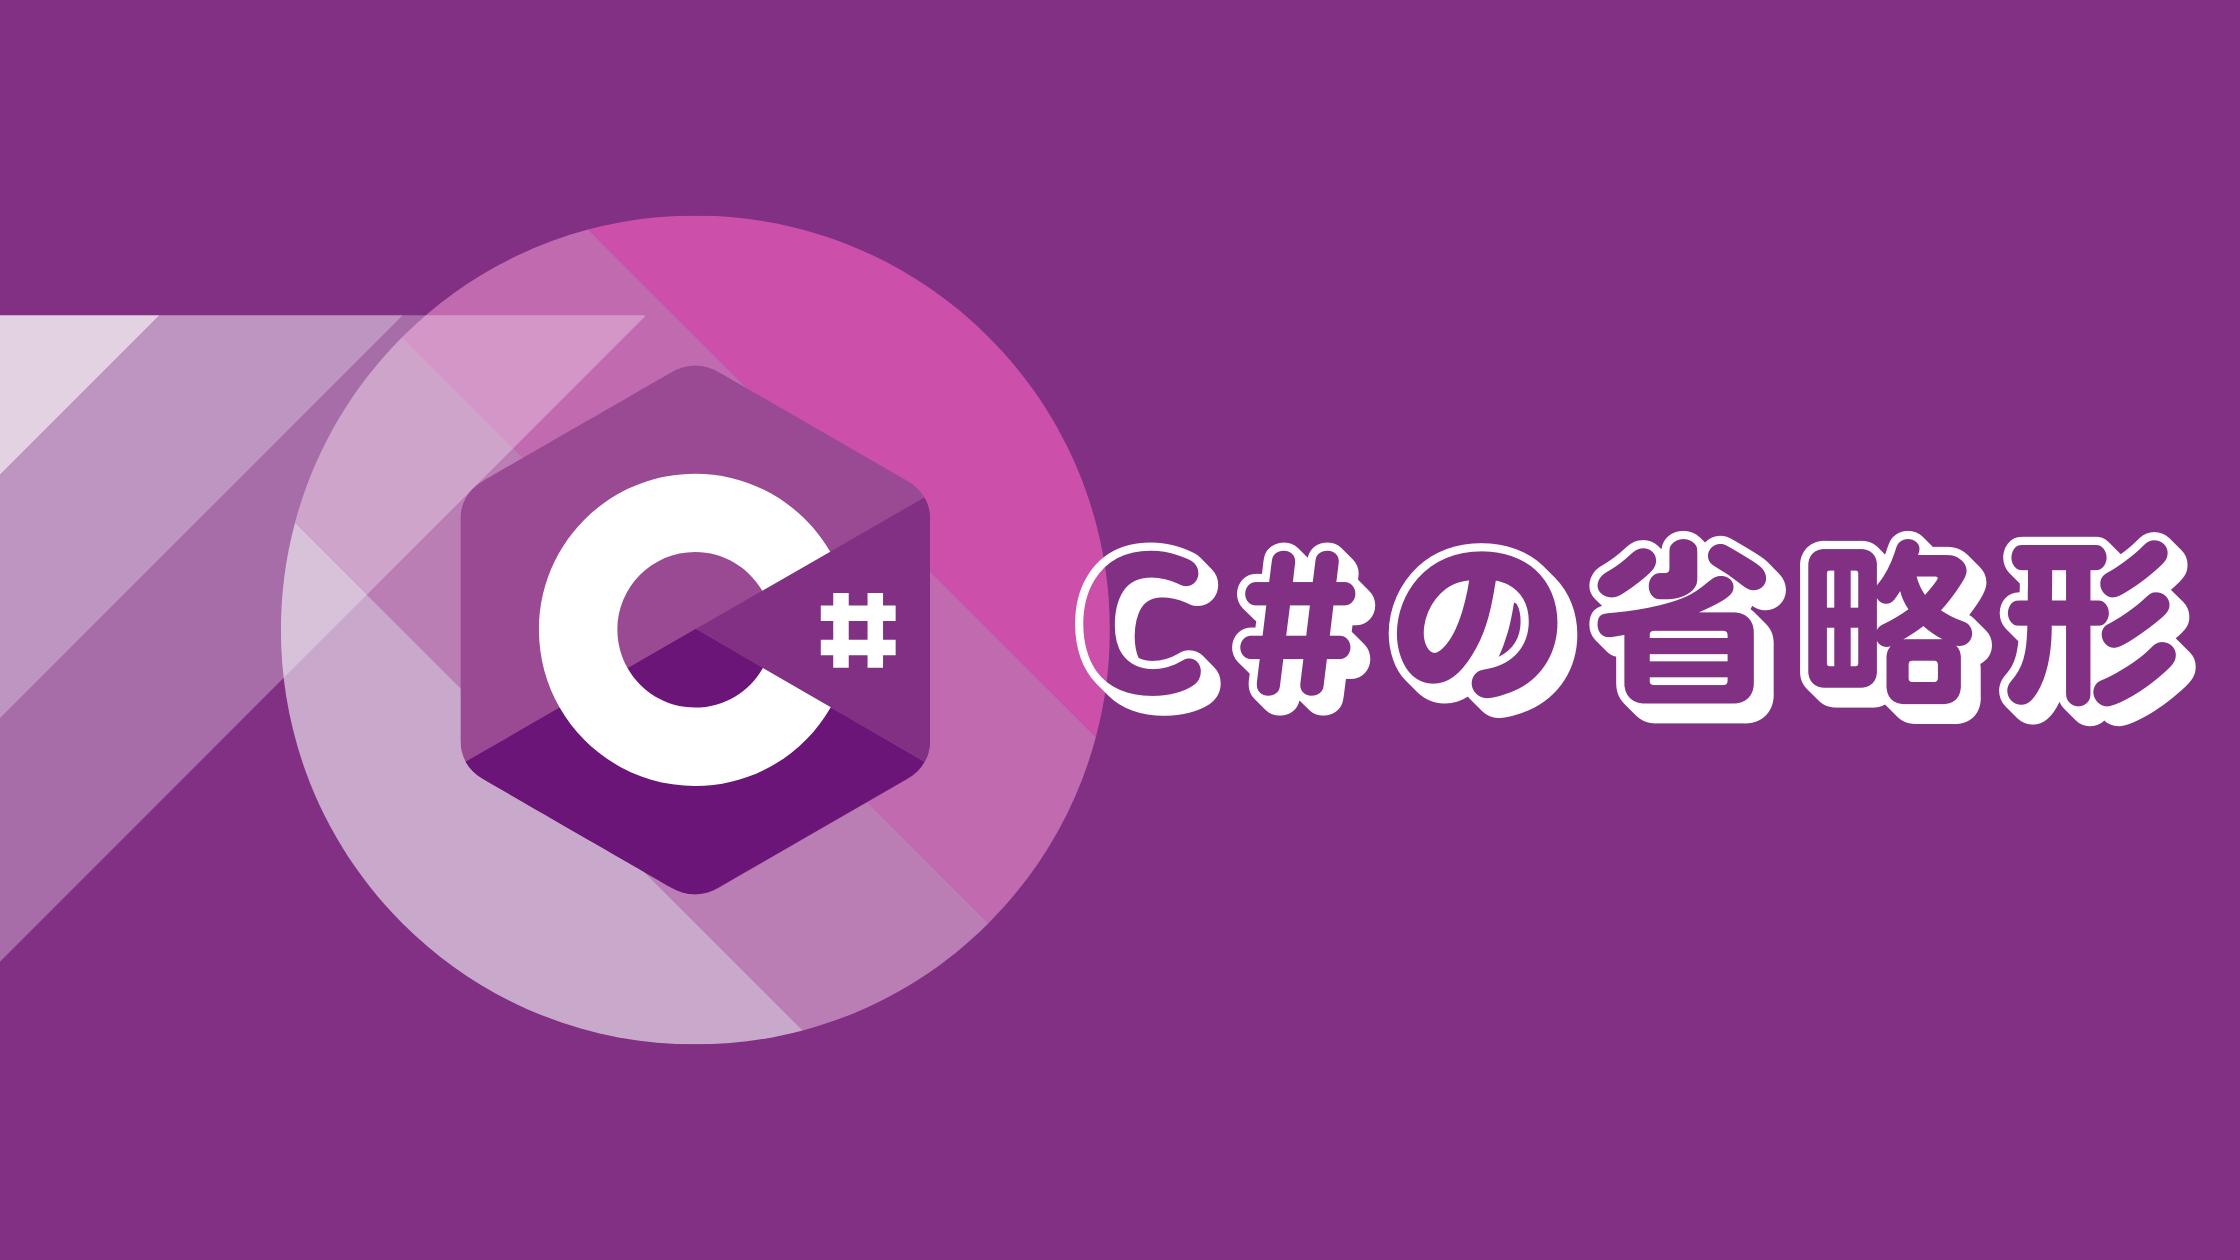 C#の省略形